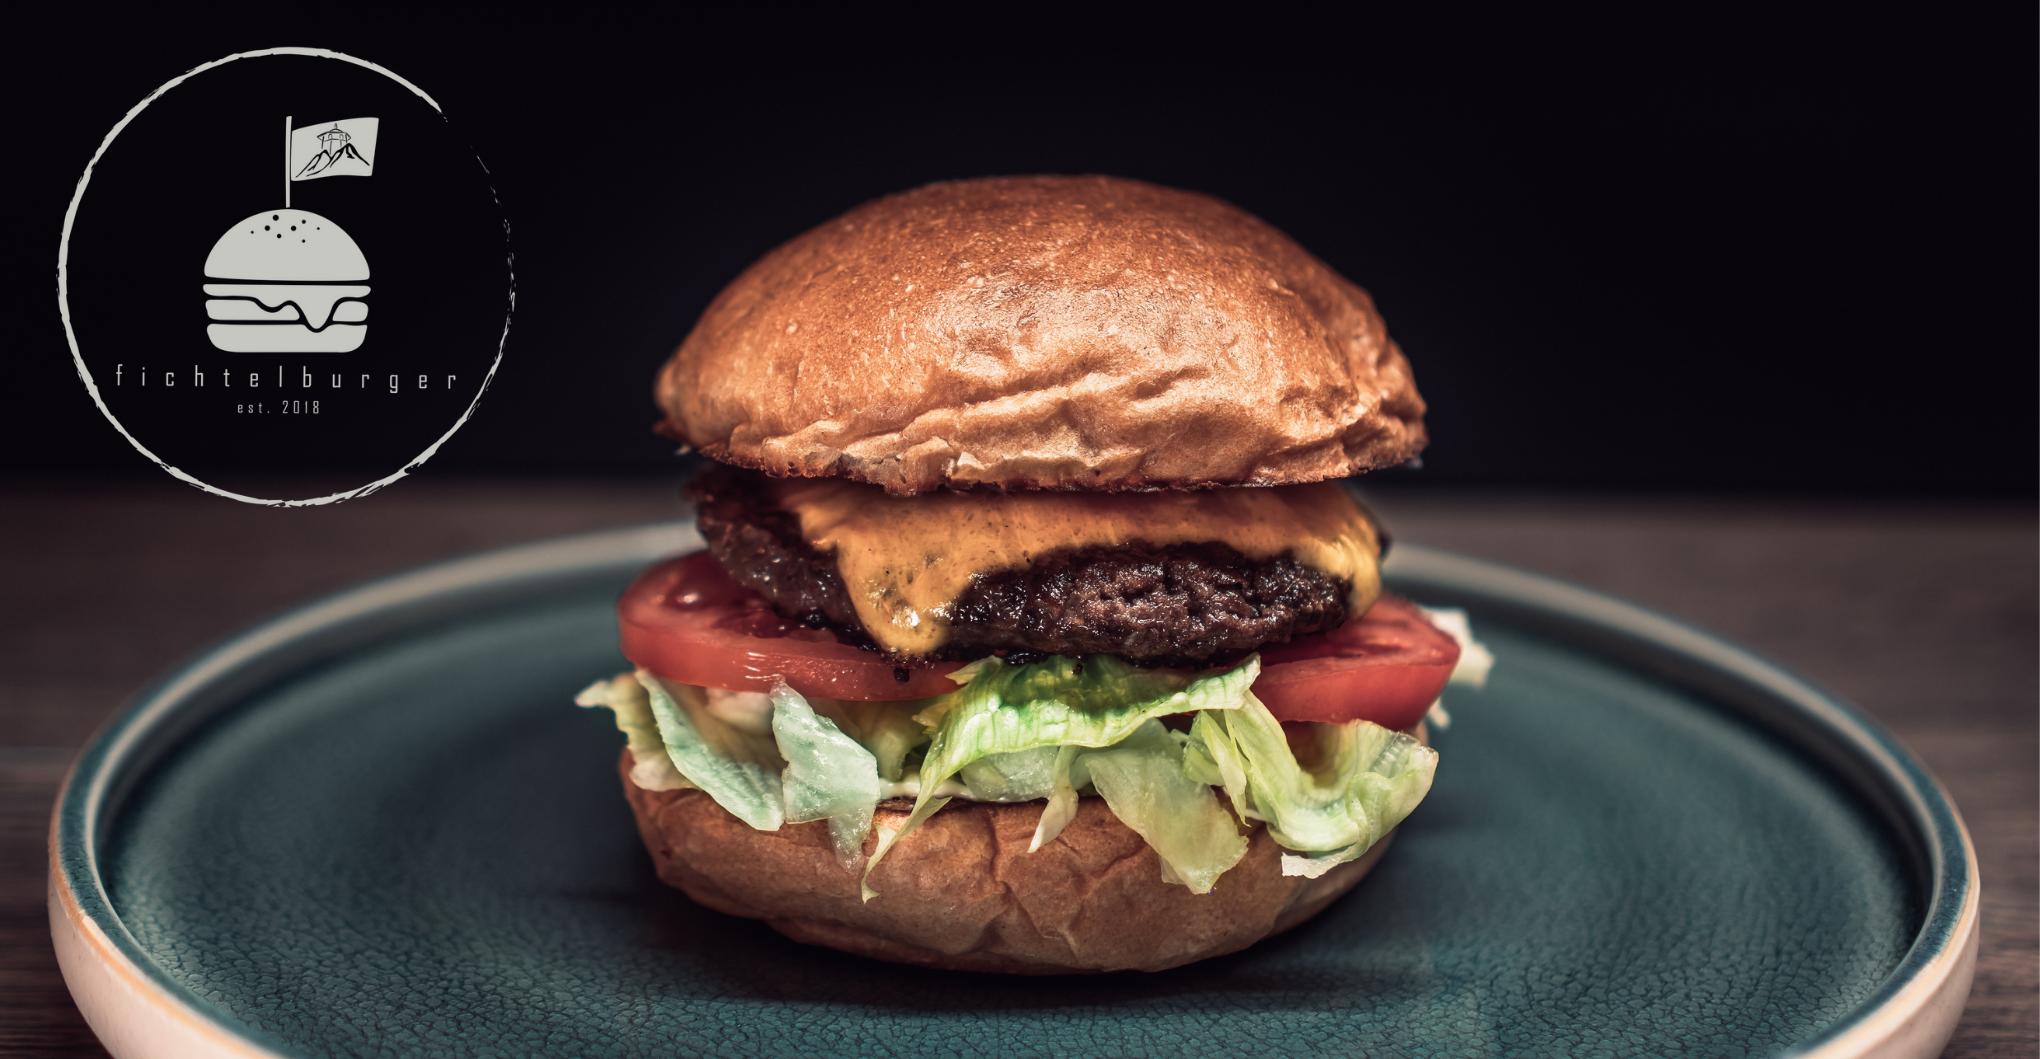 Fichtelburger - Best Burger in Town